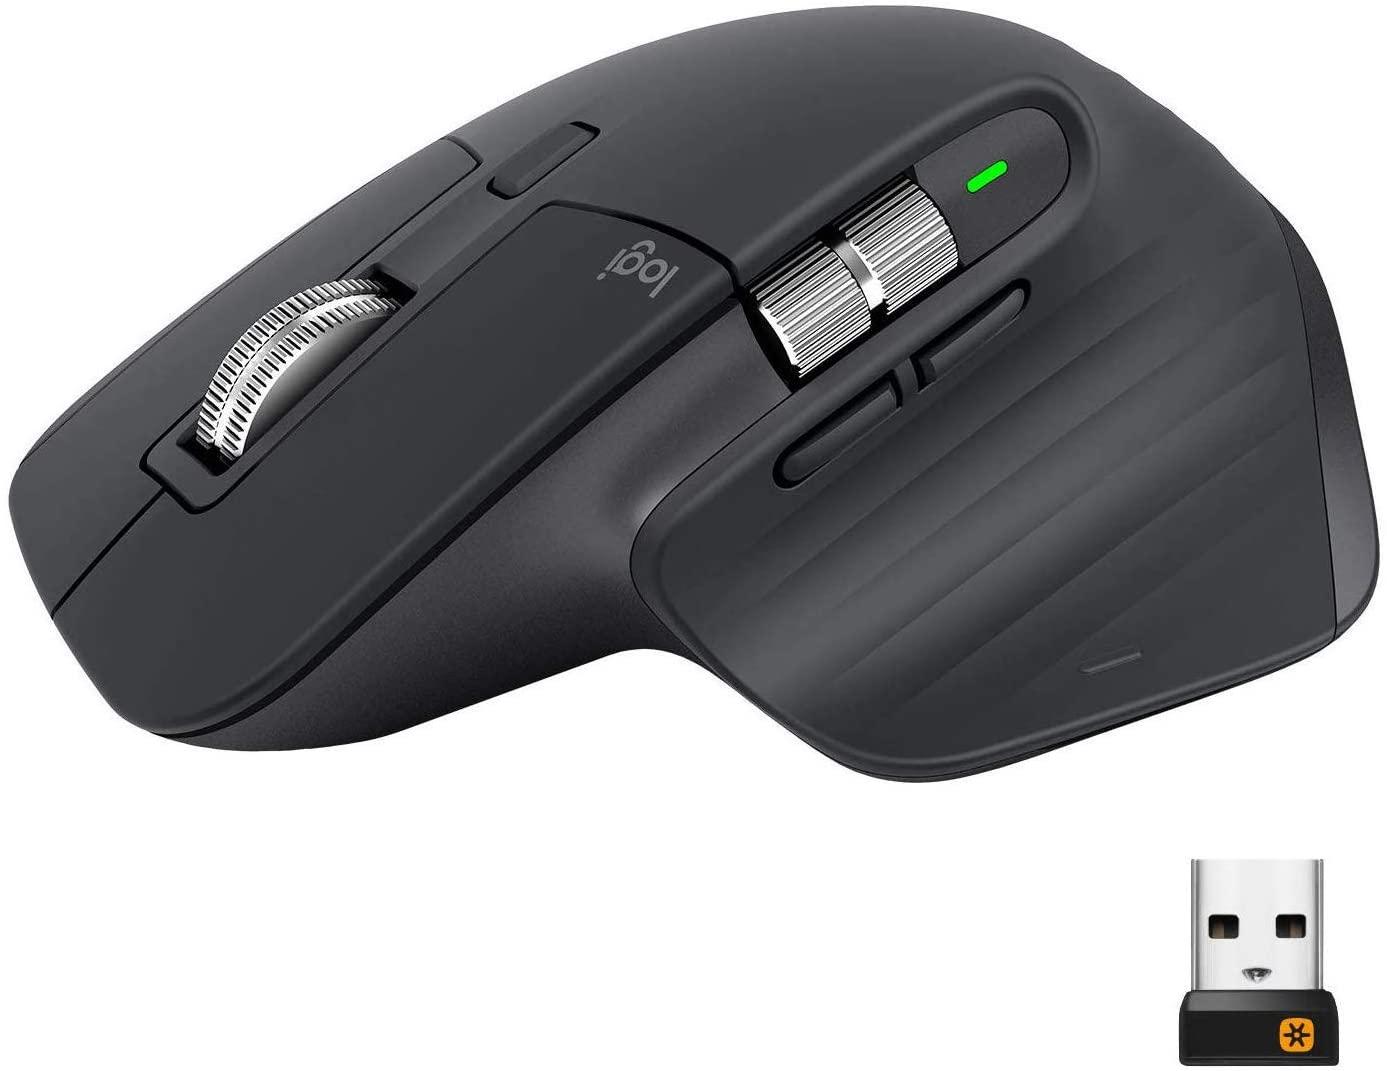 Wireless mouse Logitech MX Master 3 Advanced Wireless Mouse – GRAPHITE –  AllBestBrands.com